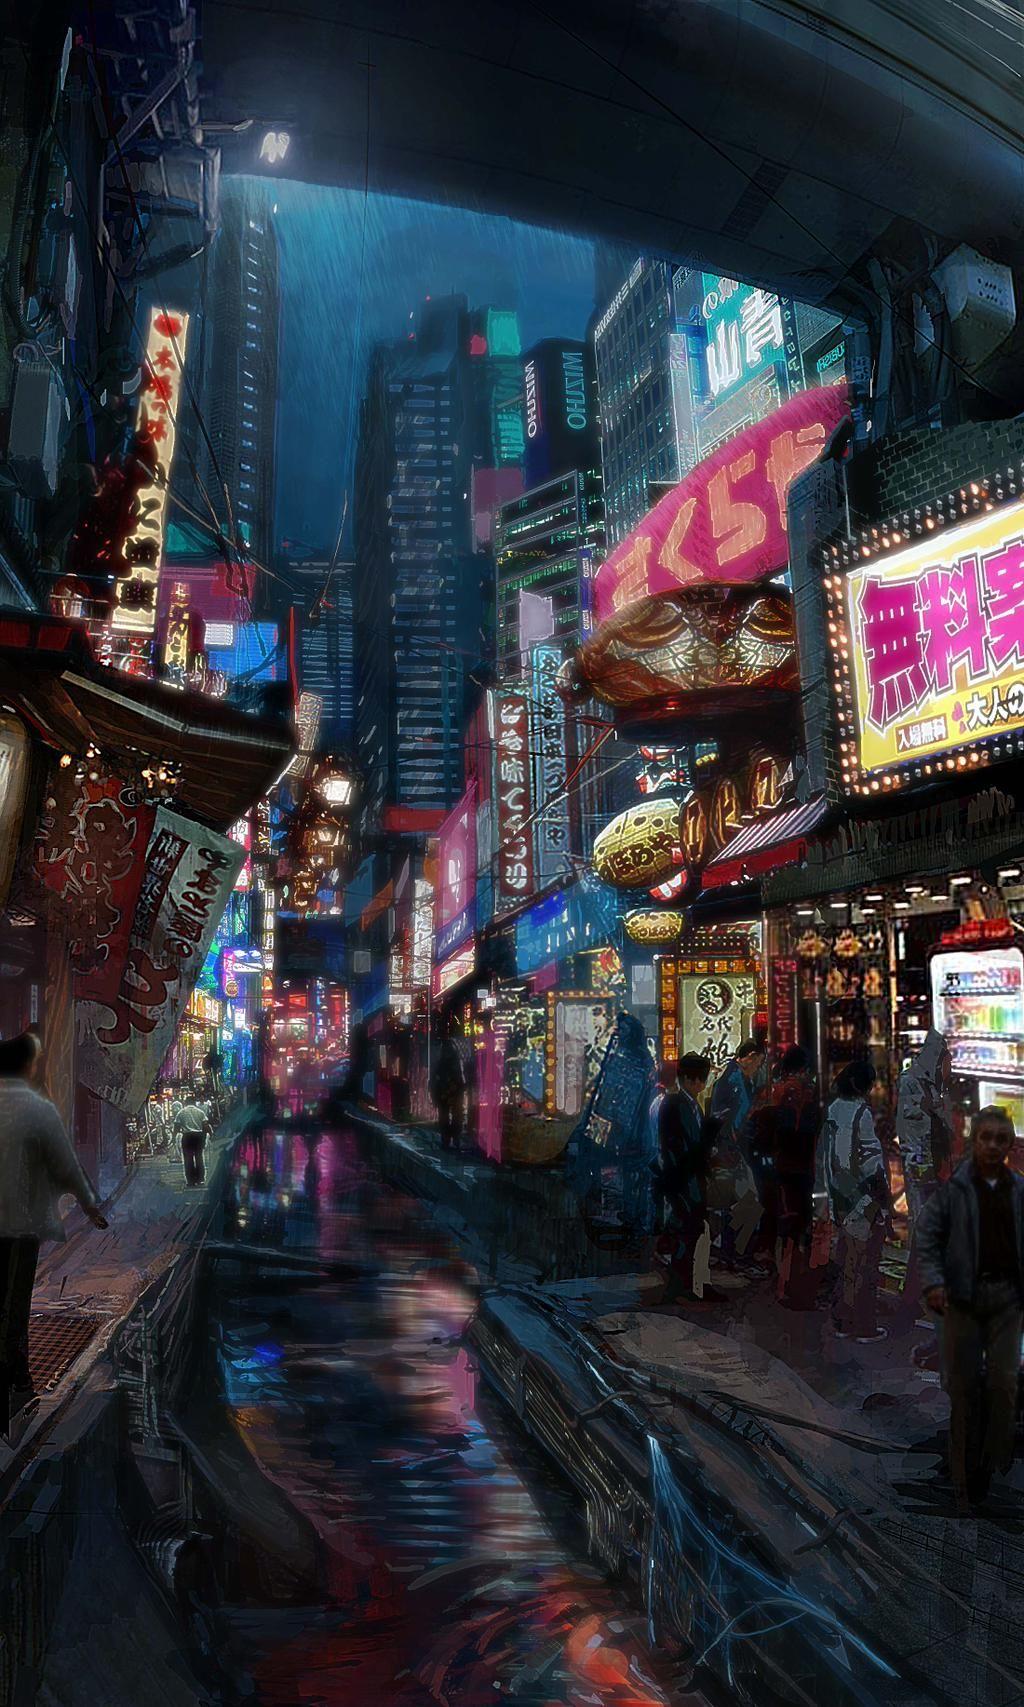 Vincenzo Natali on Night city, Embedded image permalink